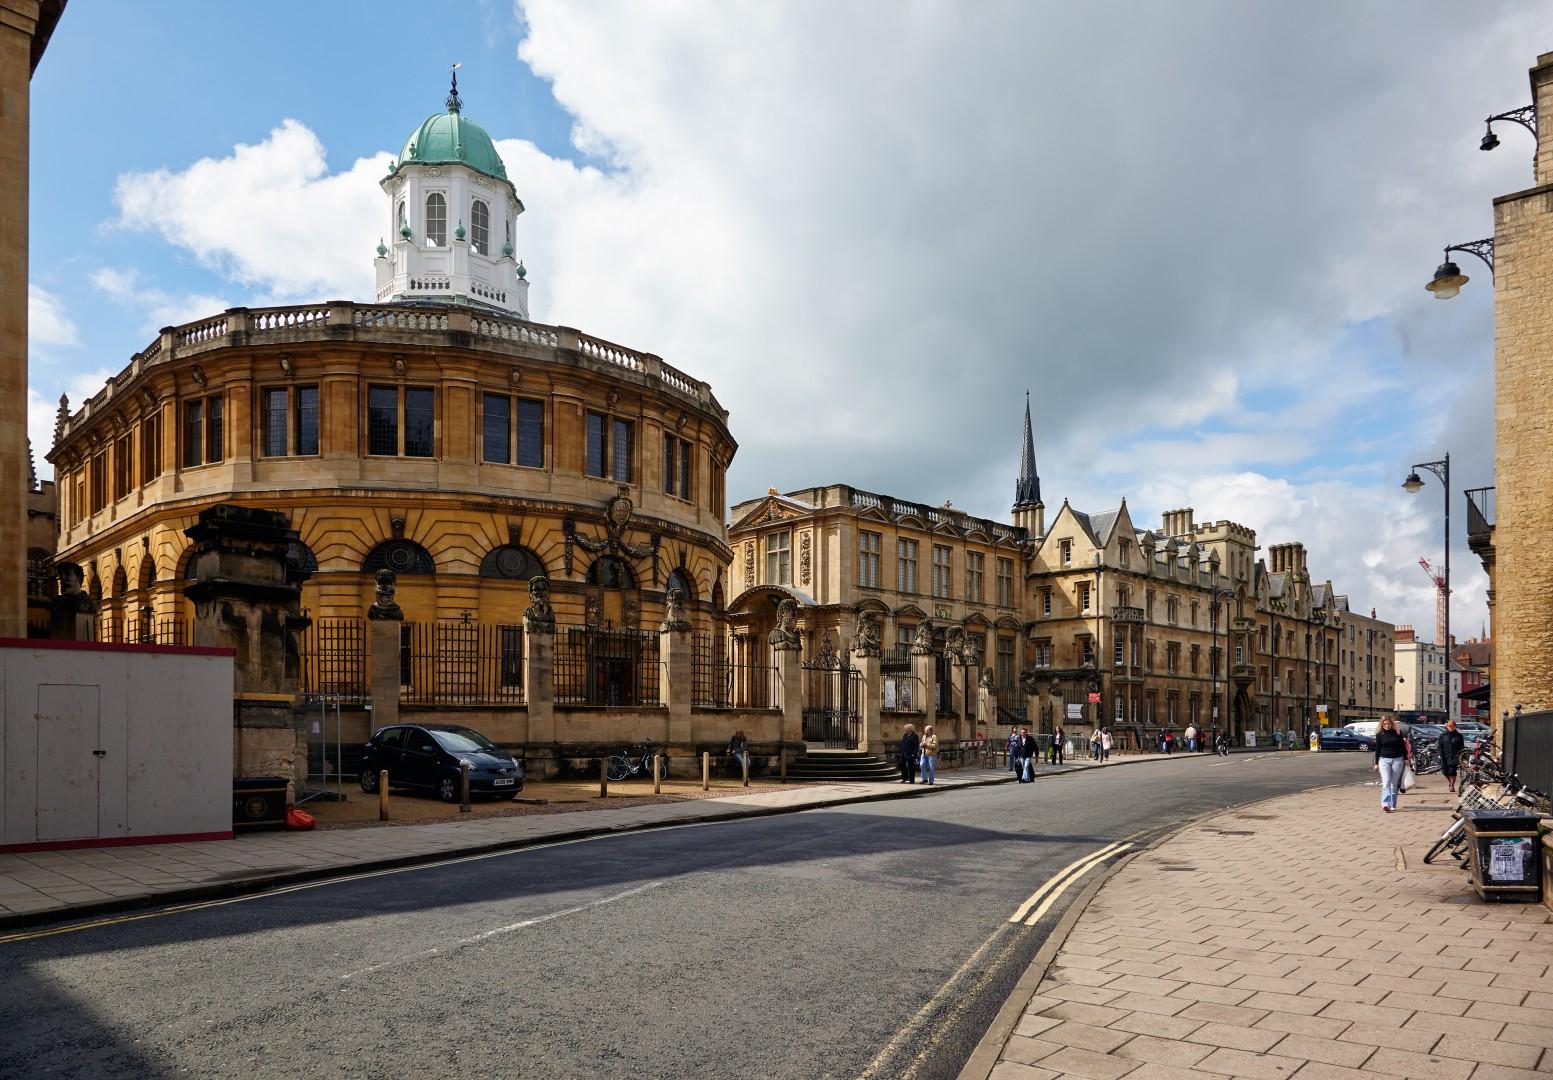 The Sheldonian Theatre Oxford